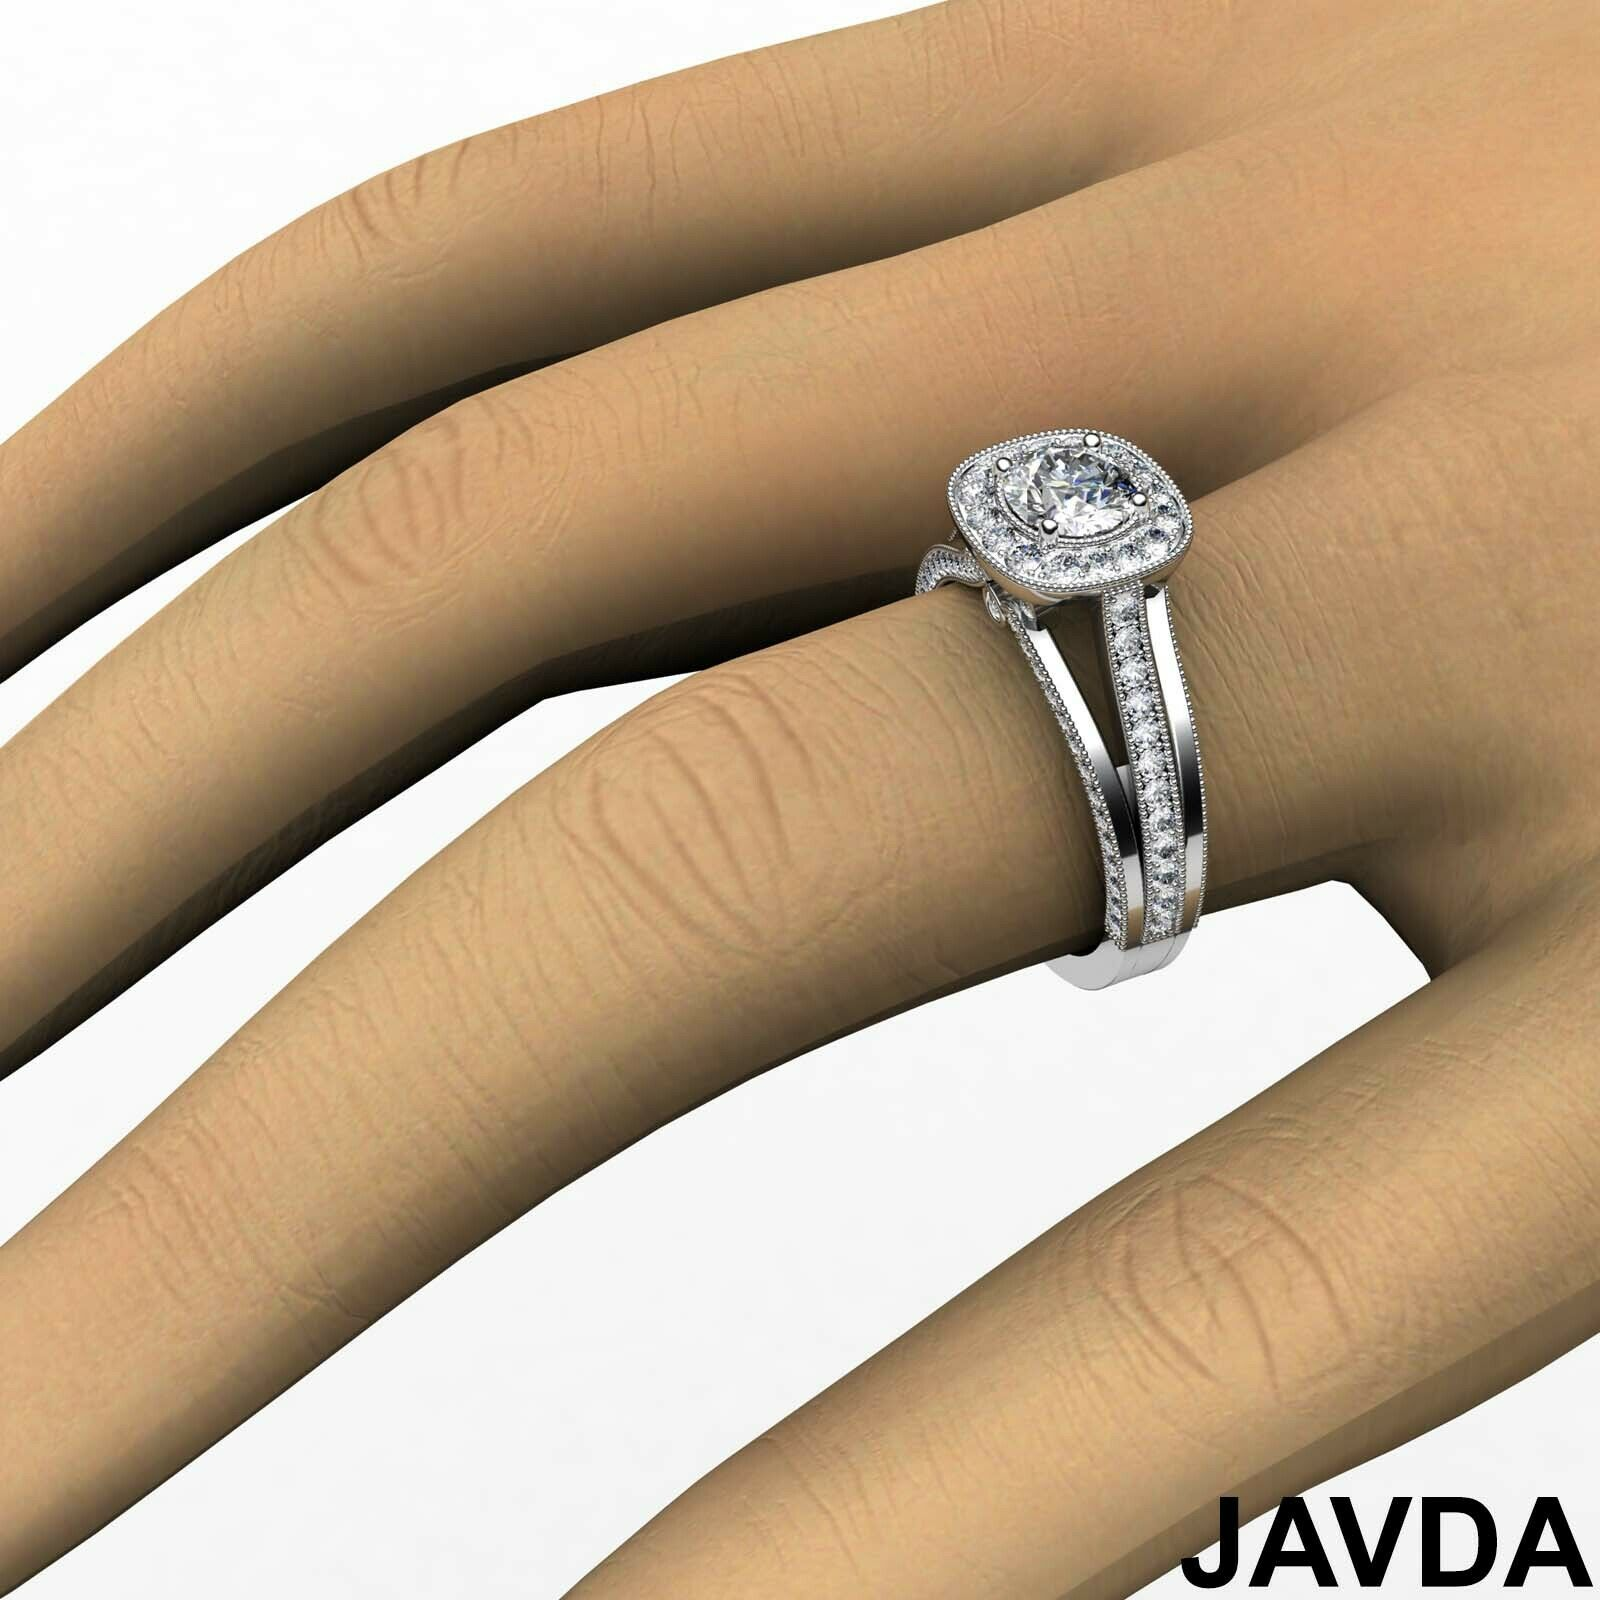 1.6ctw Bridge Accent Round Diamond Engagement Ring GIA E-VVS2 White Gold Rings 4